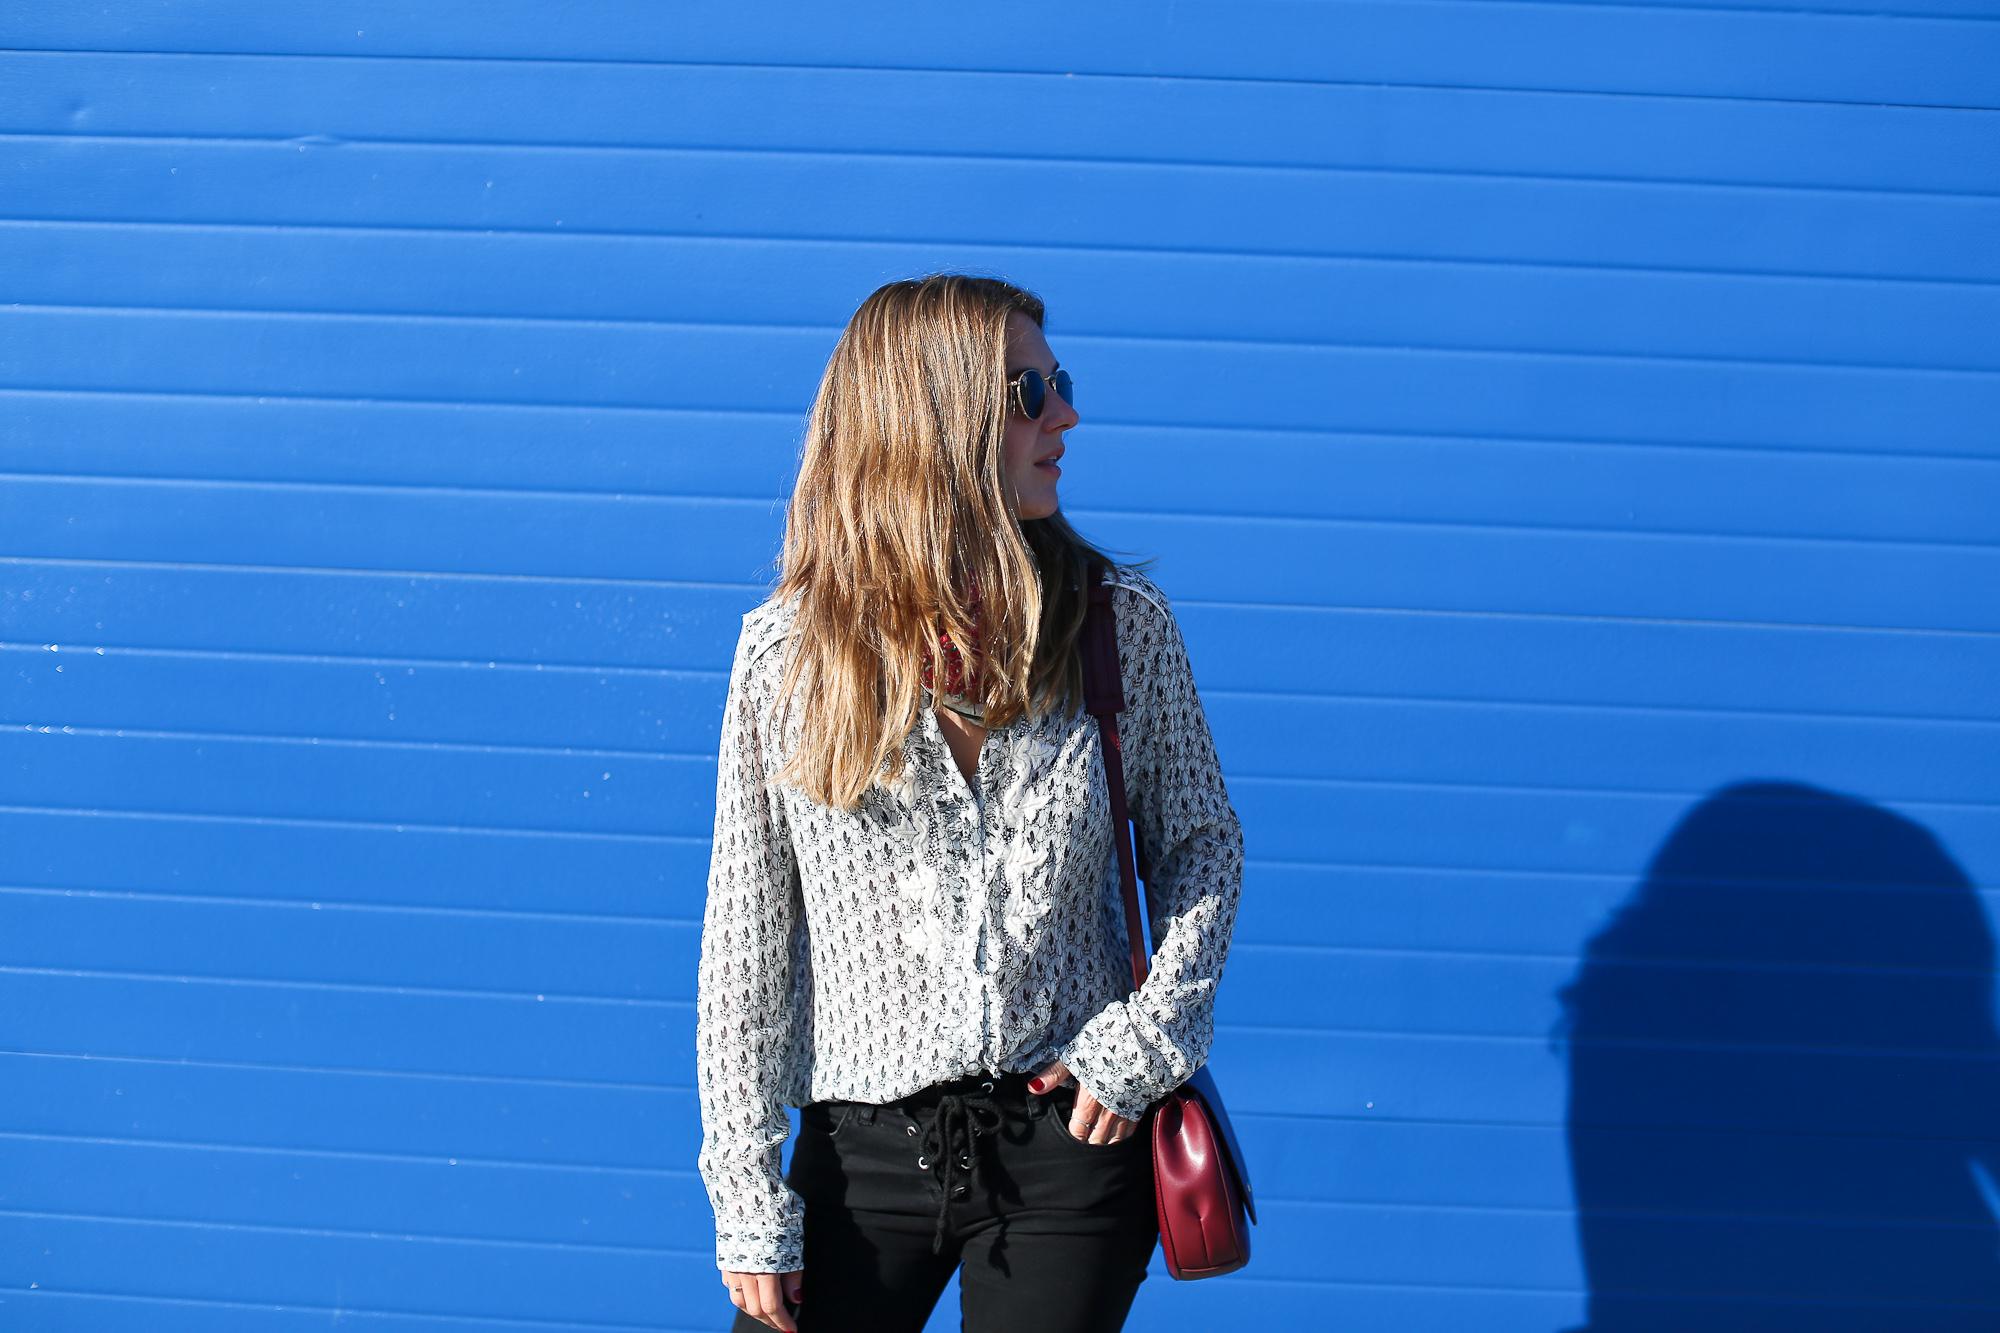 Clochet_streetstyle_fashionblogger_concordneo_adidasstansmith_mangomarantjeans-6